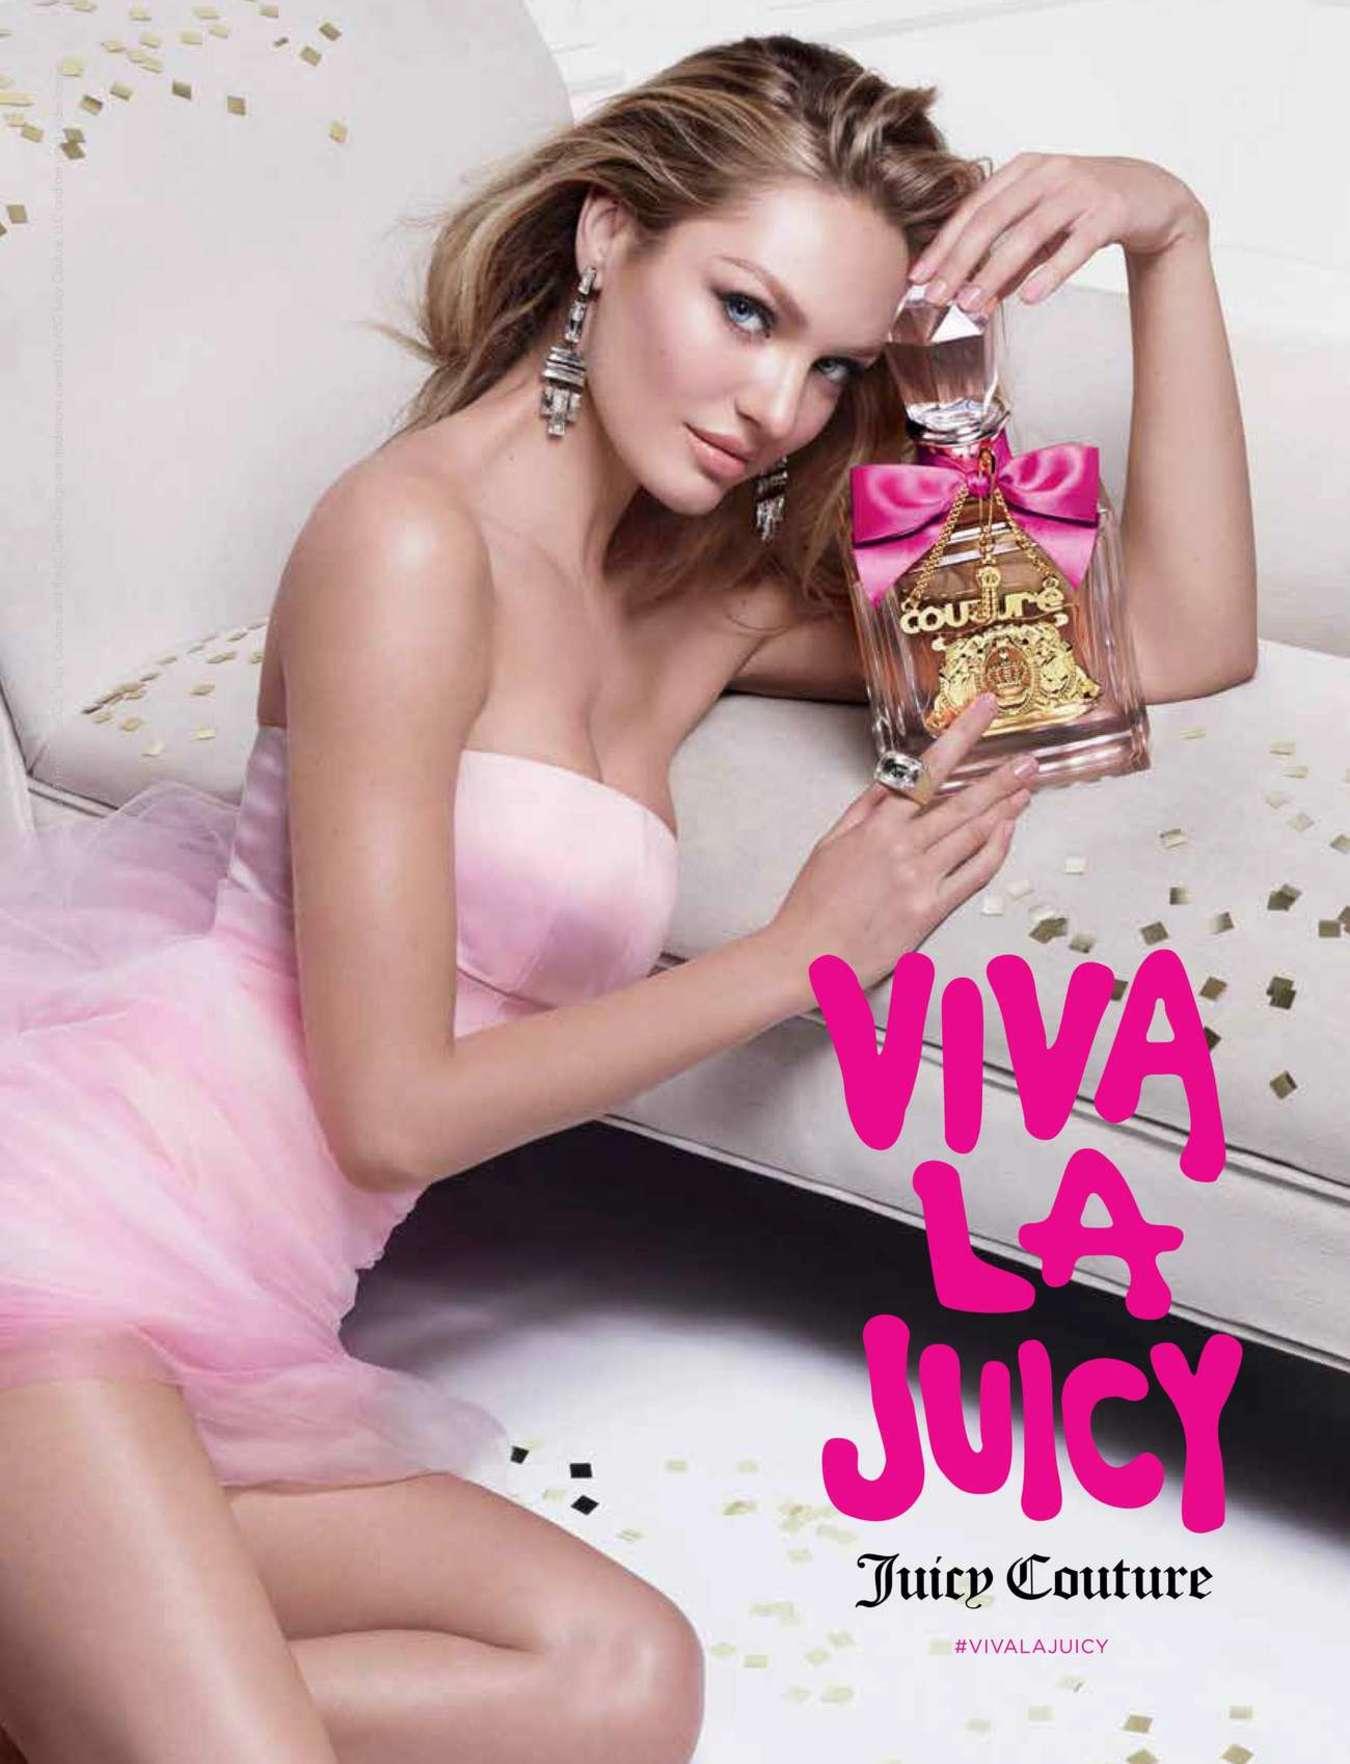 Candice Swanepoel - New Face of Viva La Juicy Fragrance